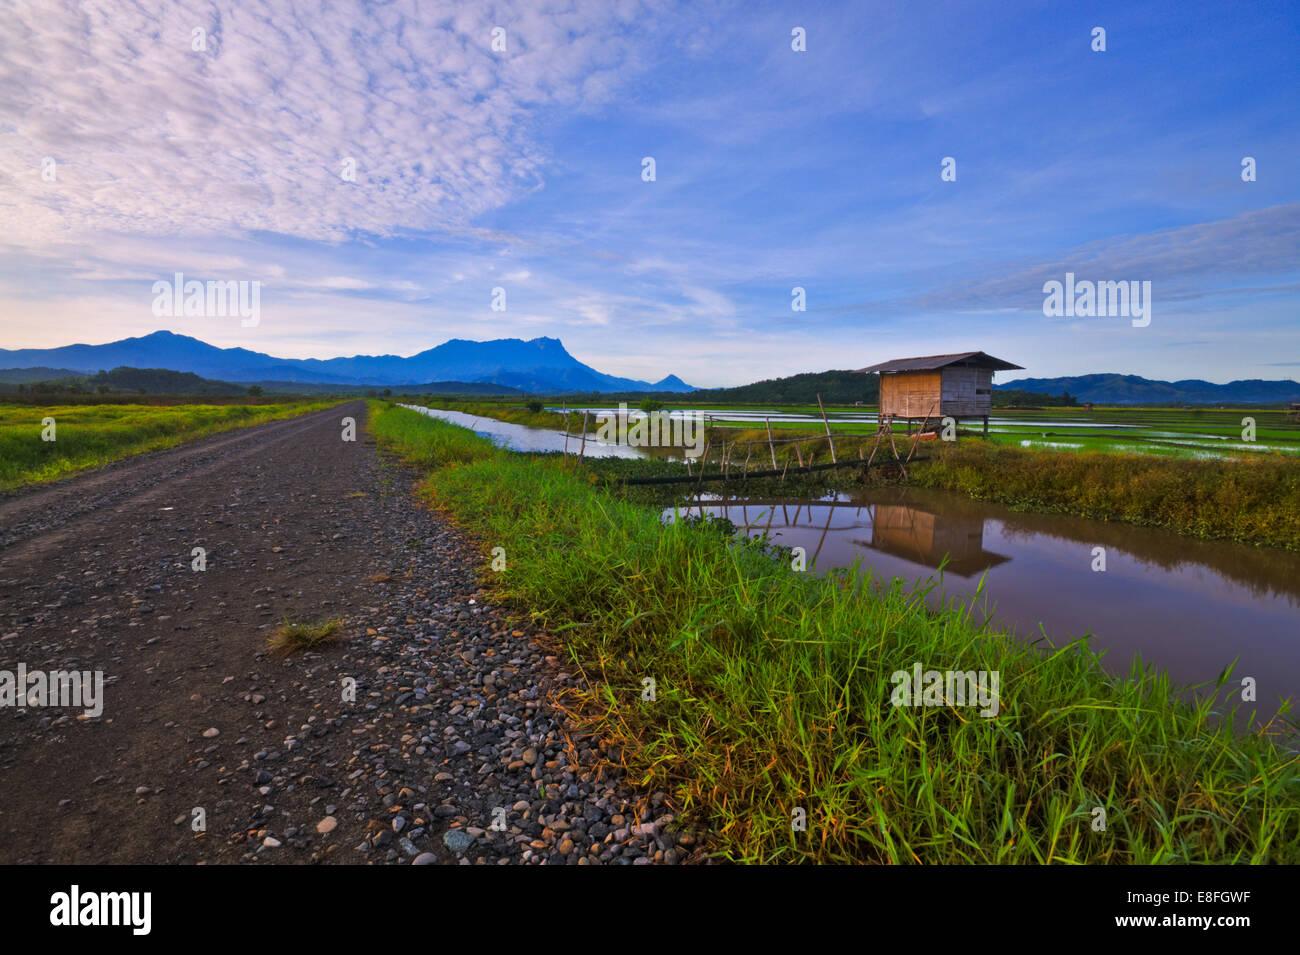 Malaysia, Sabah, Kota Belud, Sunrise over Sangkir Village - Stock Image